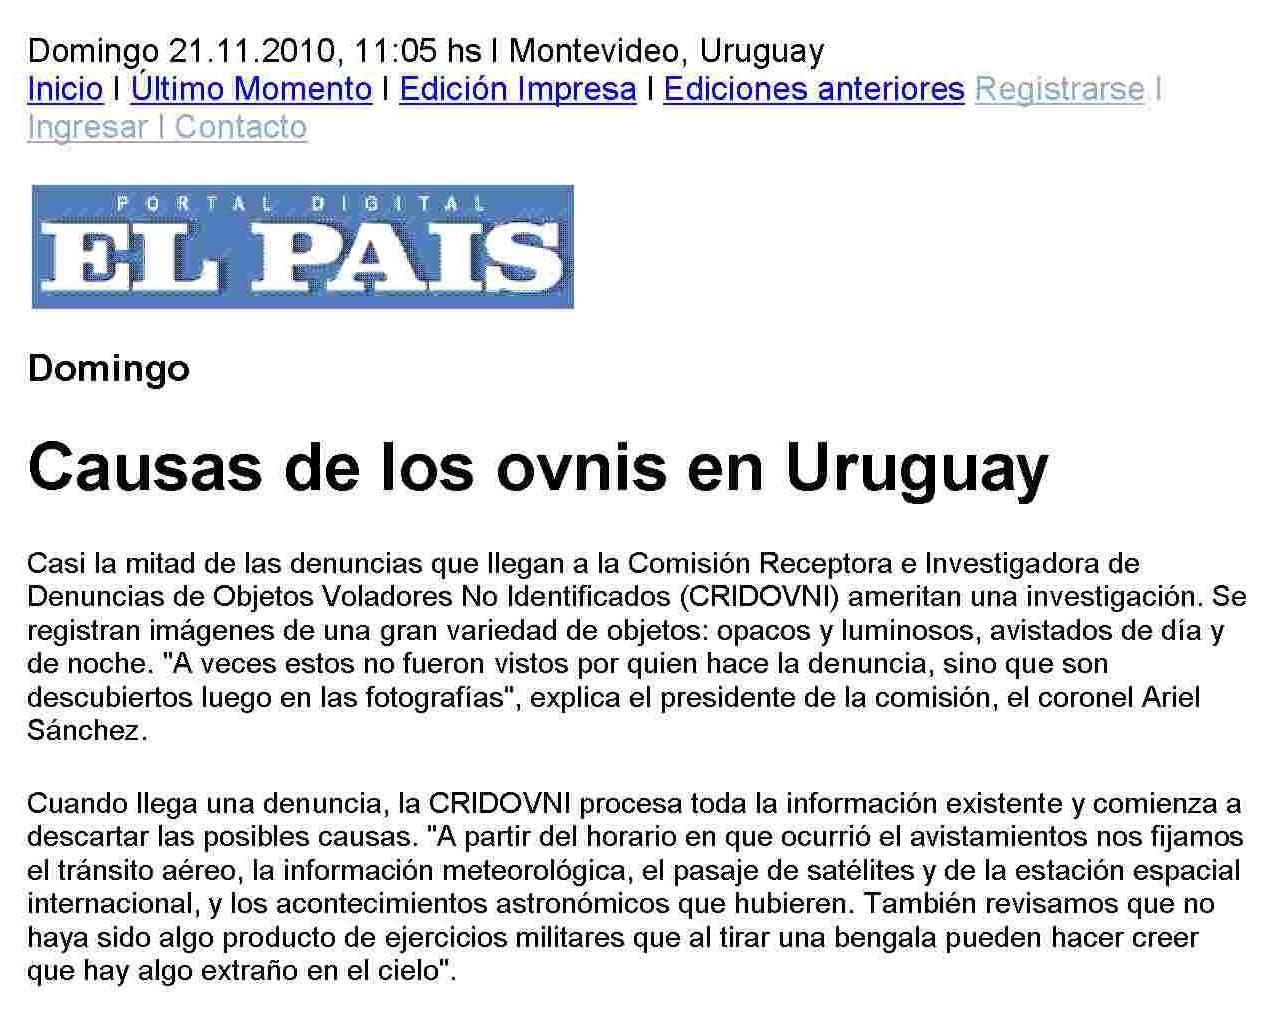 diario el pais uruguayo: